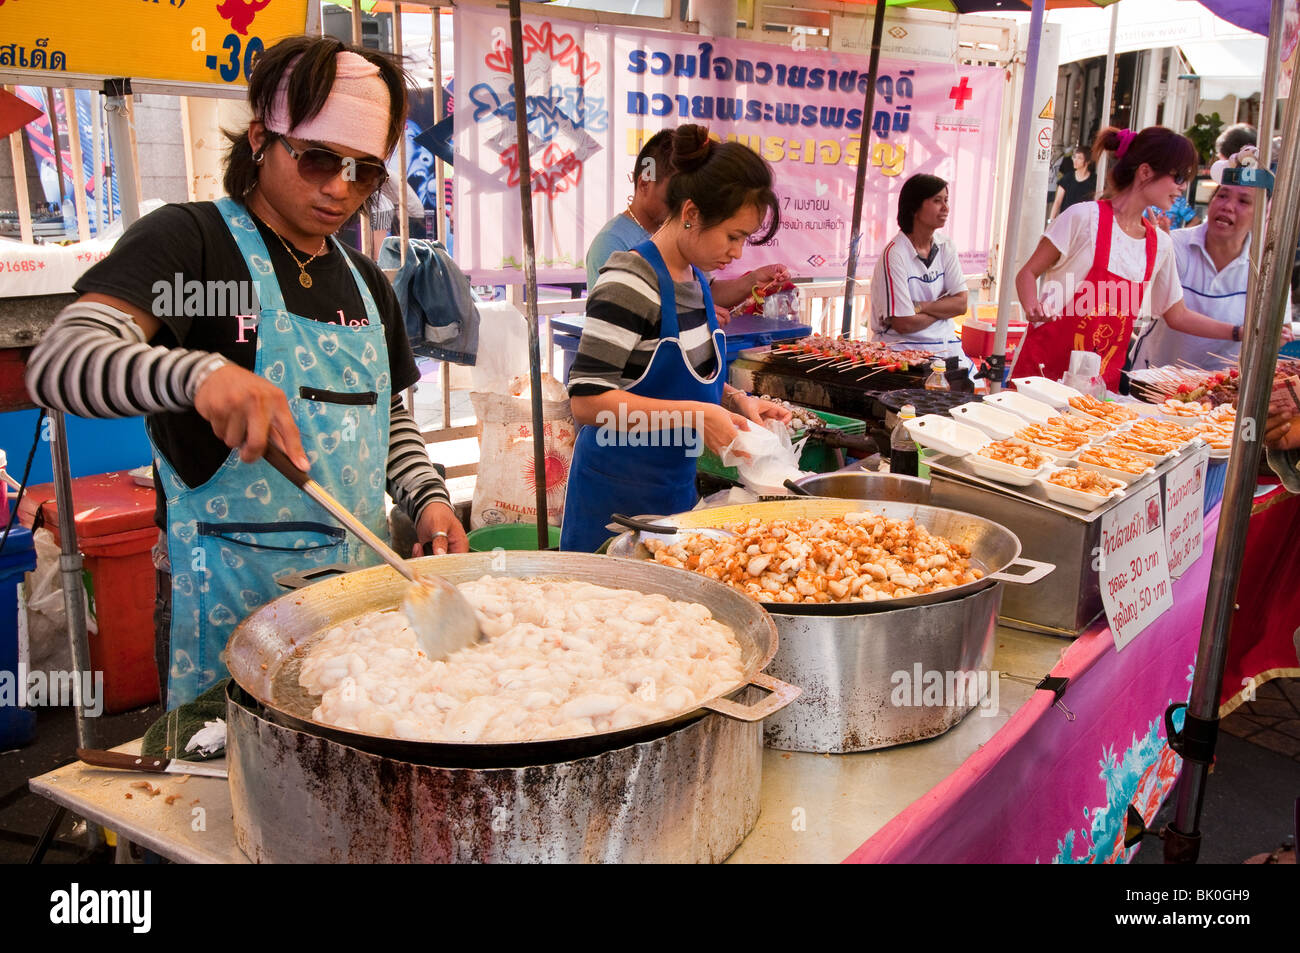 Chatuchak Weekend Market food vendor stall; Bangkok, Thailand. (Largest market in Thailand). - Stock Image